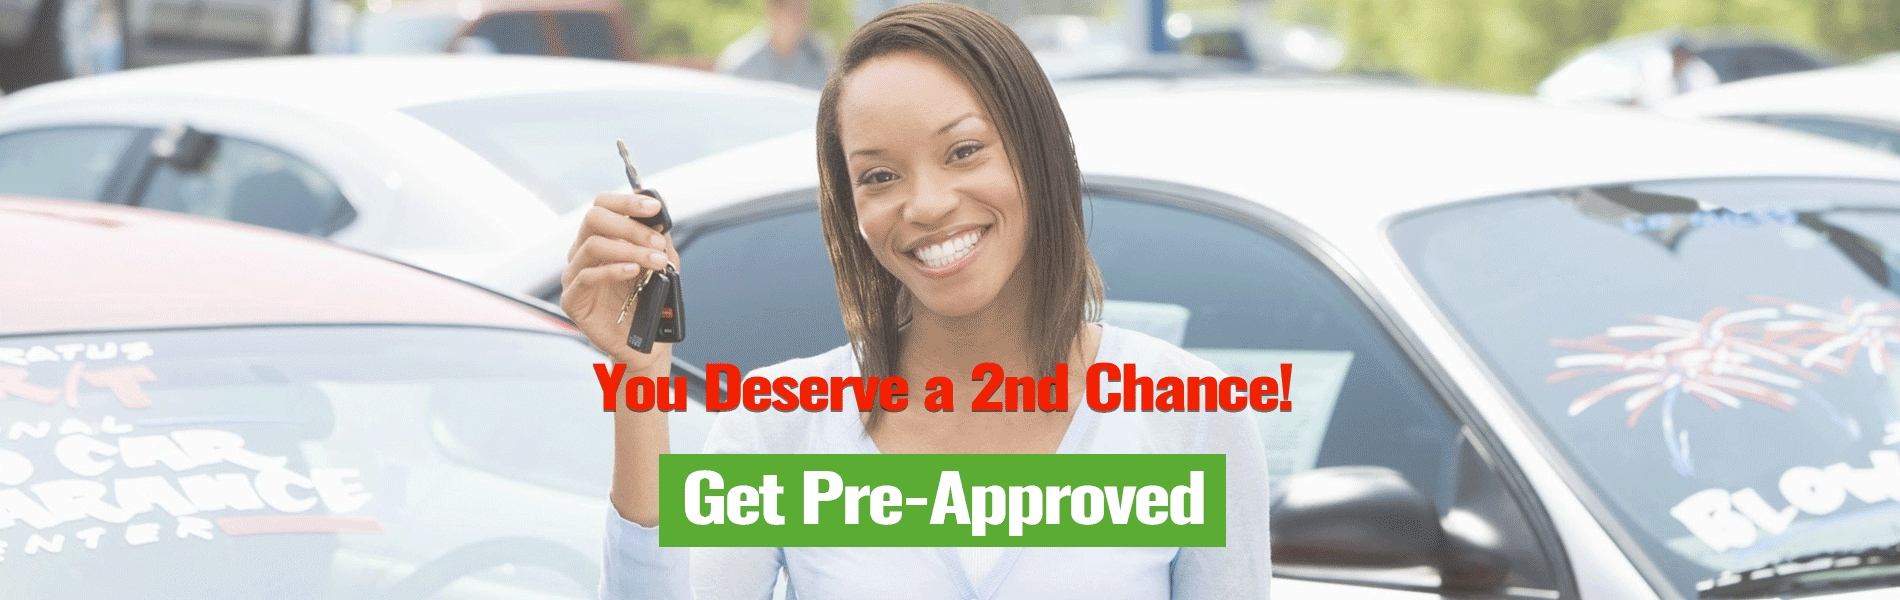 2nd Chance Colorado | Poor Credit & Bankruptcy Financing | Auto Loans Denver